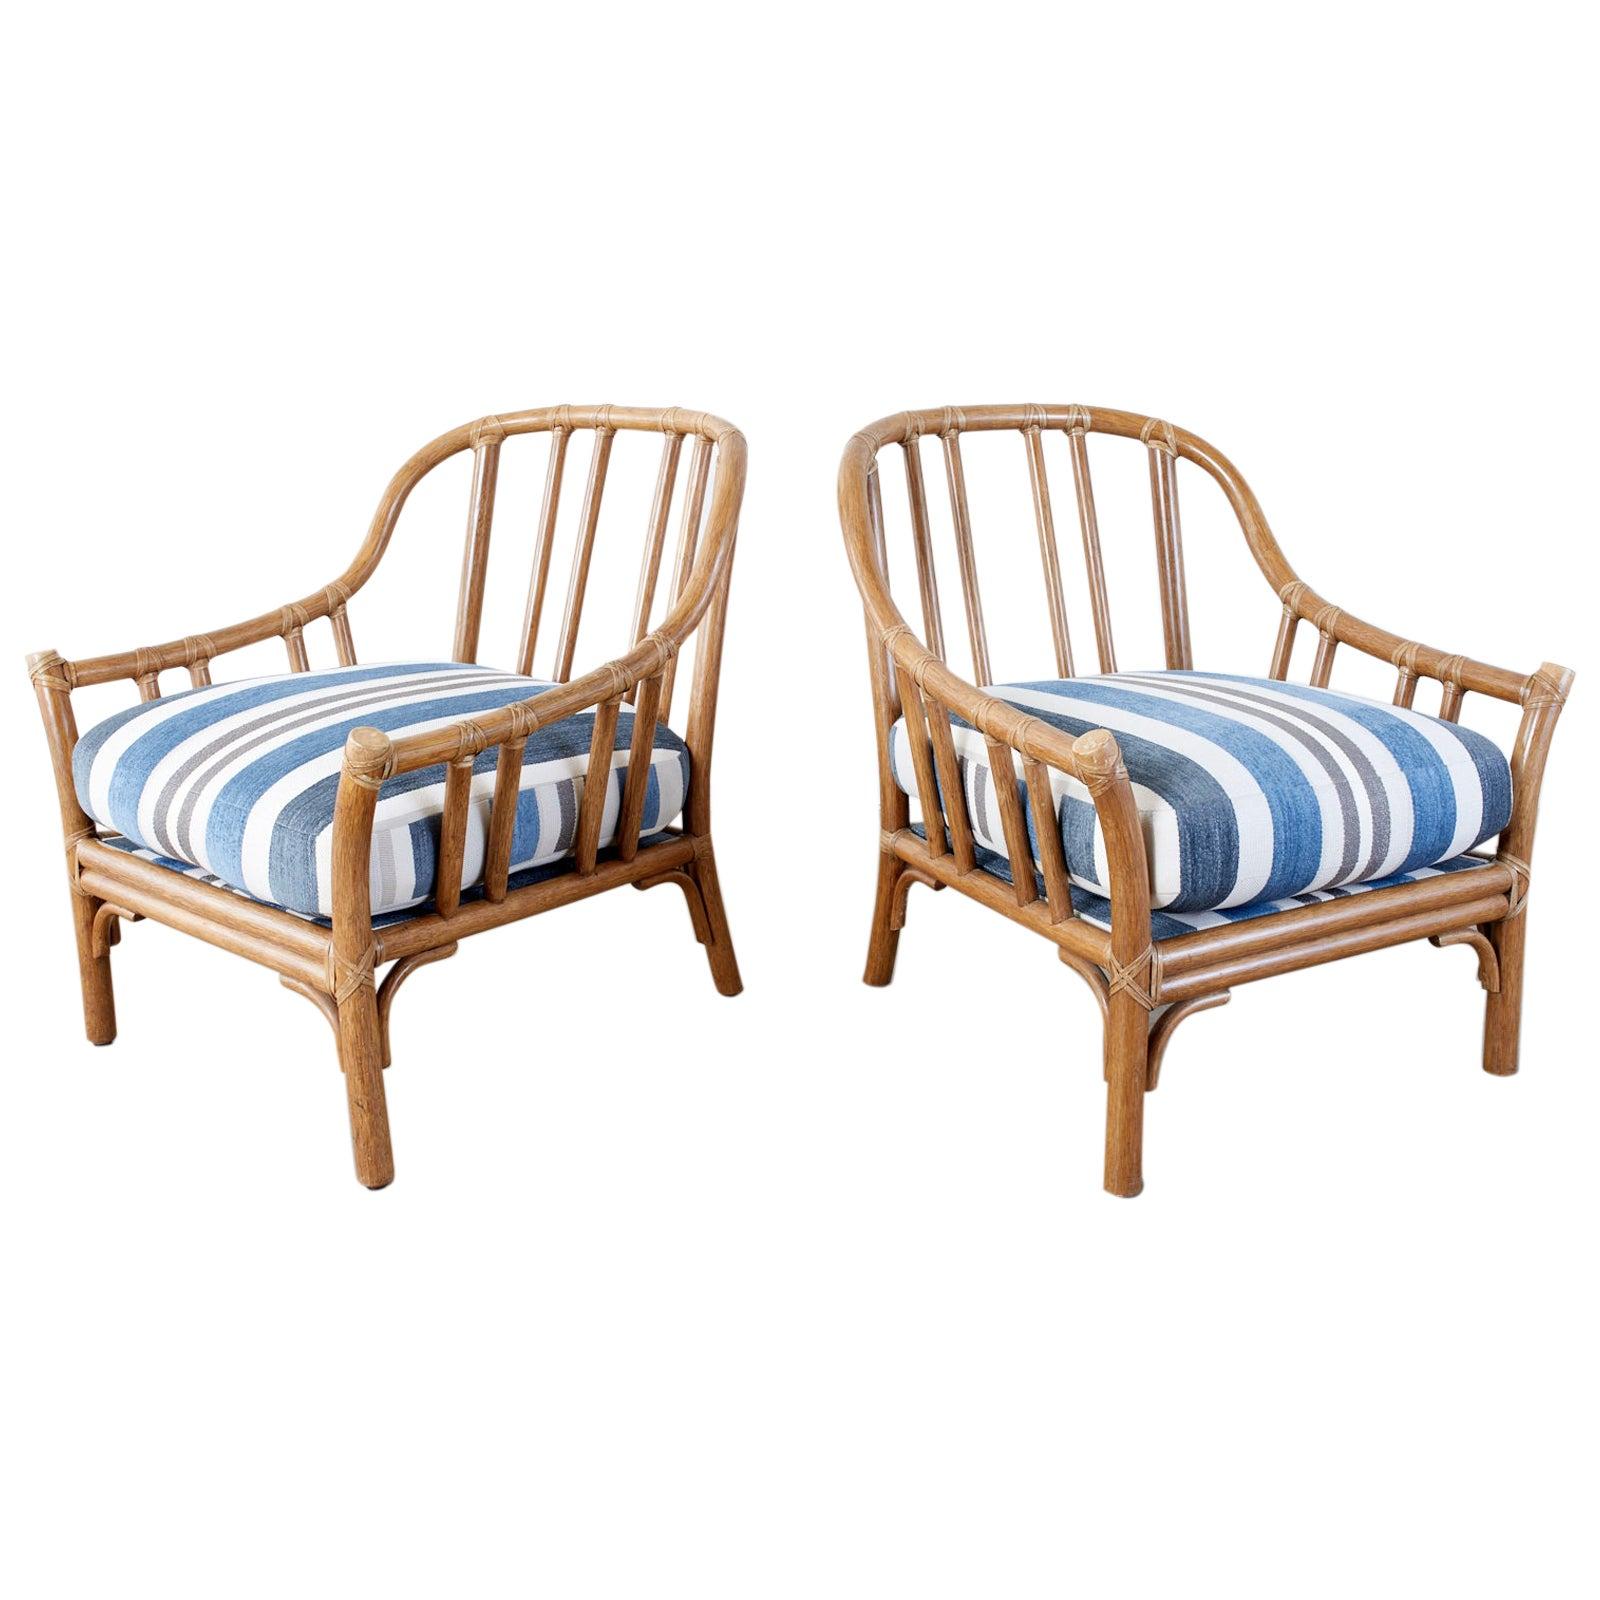 Pair of McGuire Organic Modern Rattan Lounge Chairs